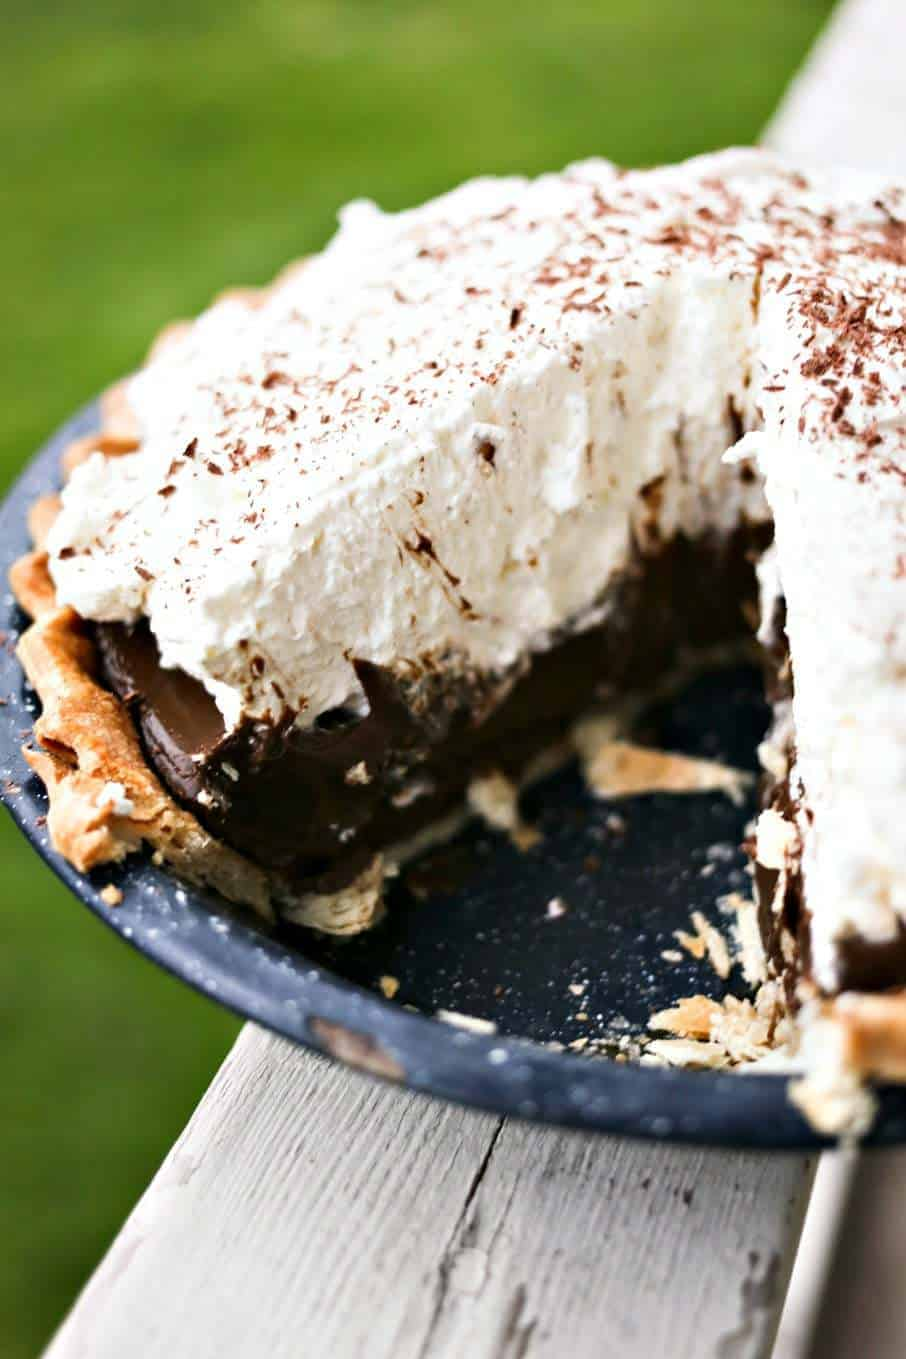 Cream her lick pie